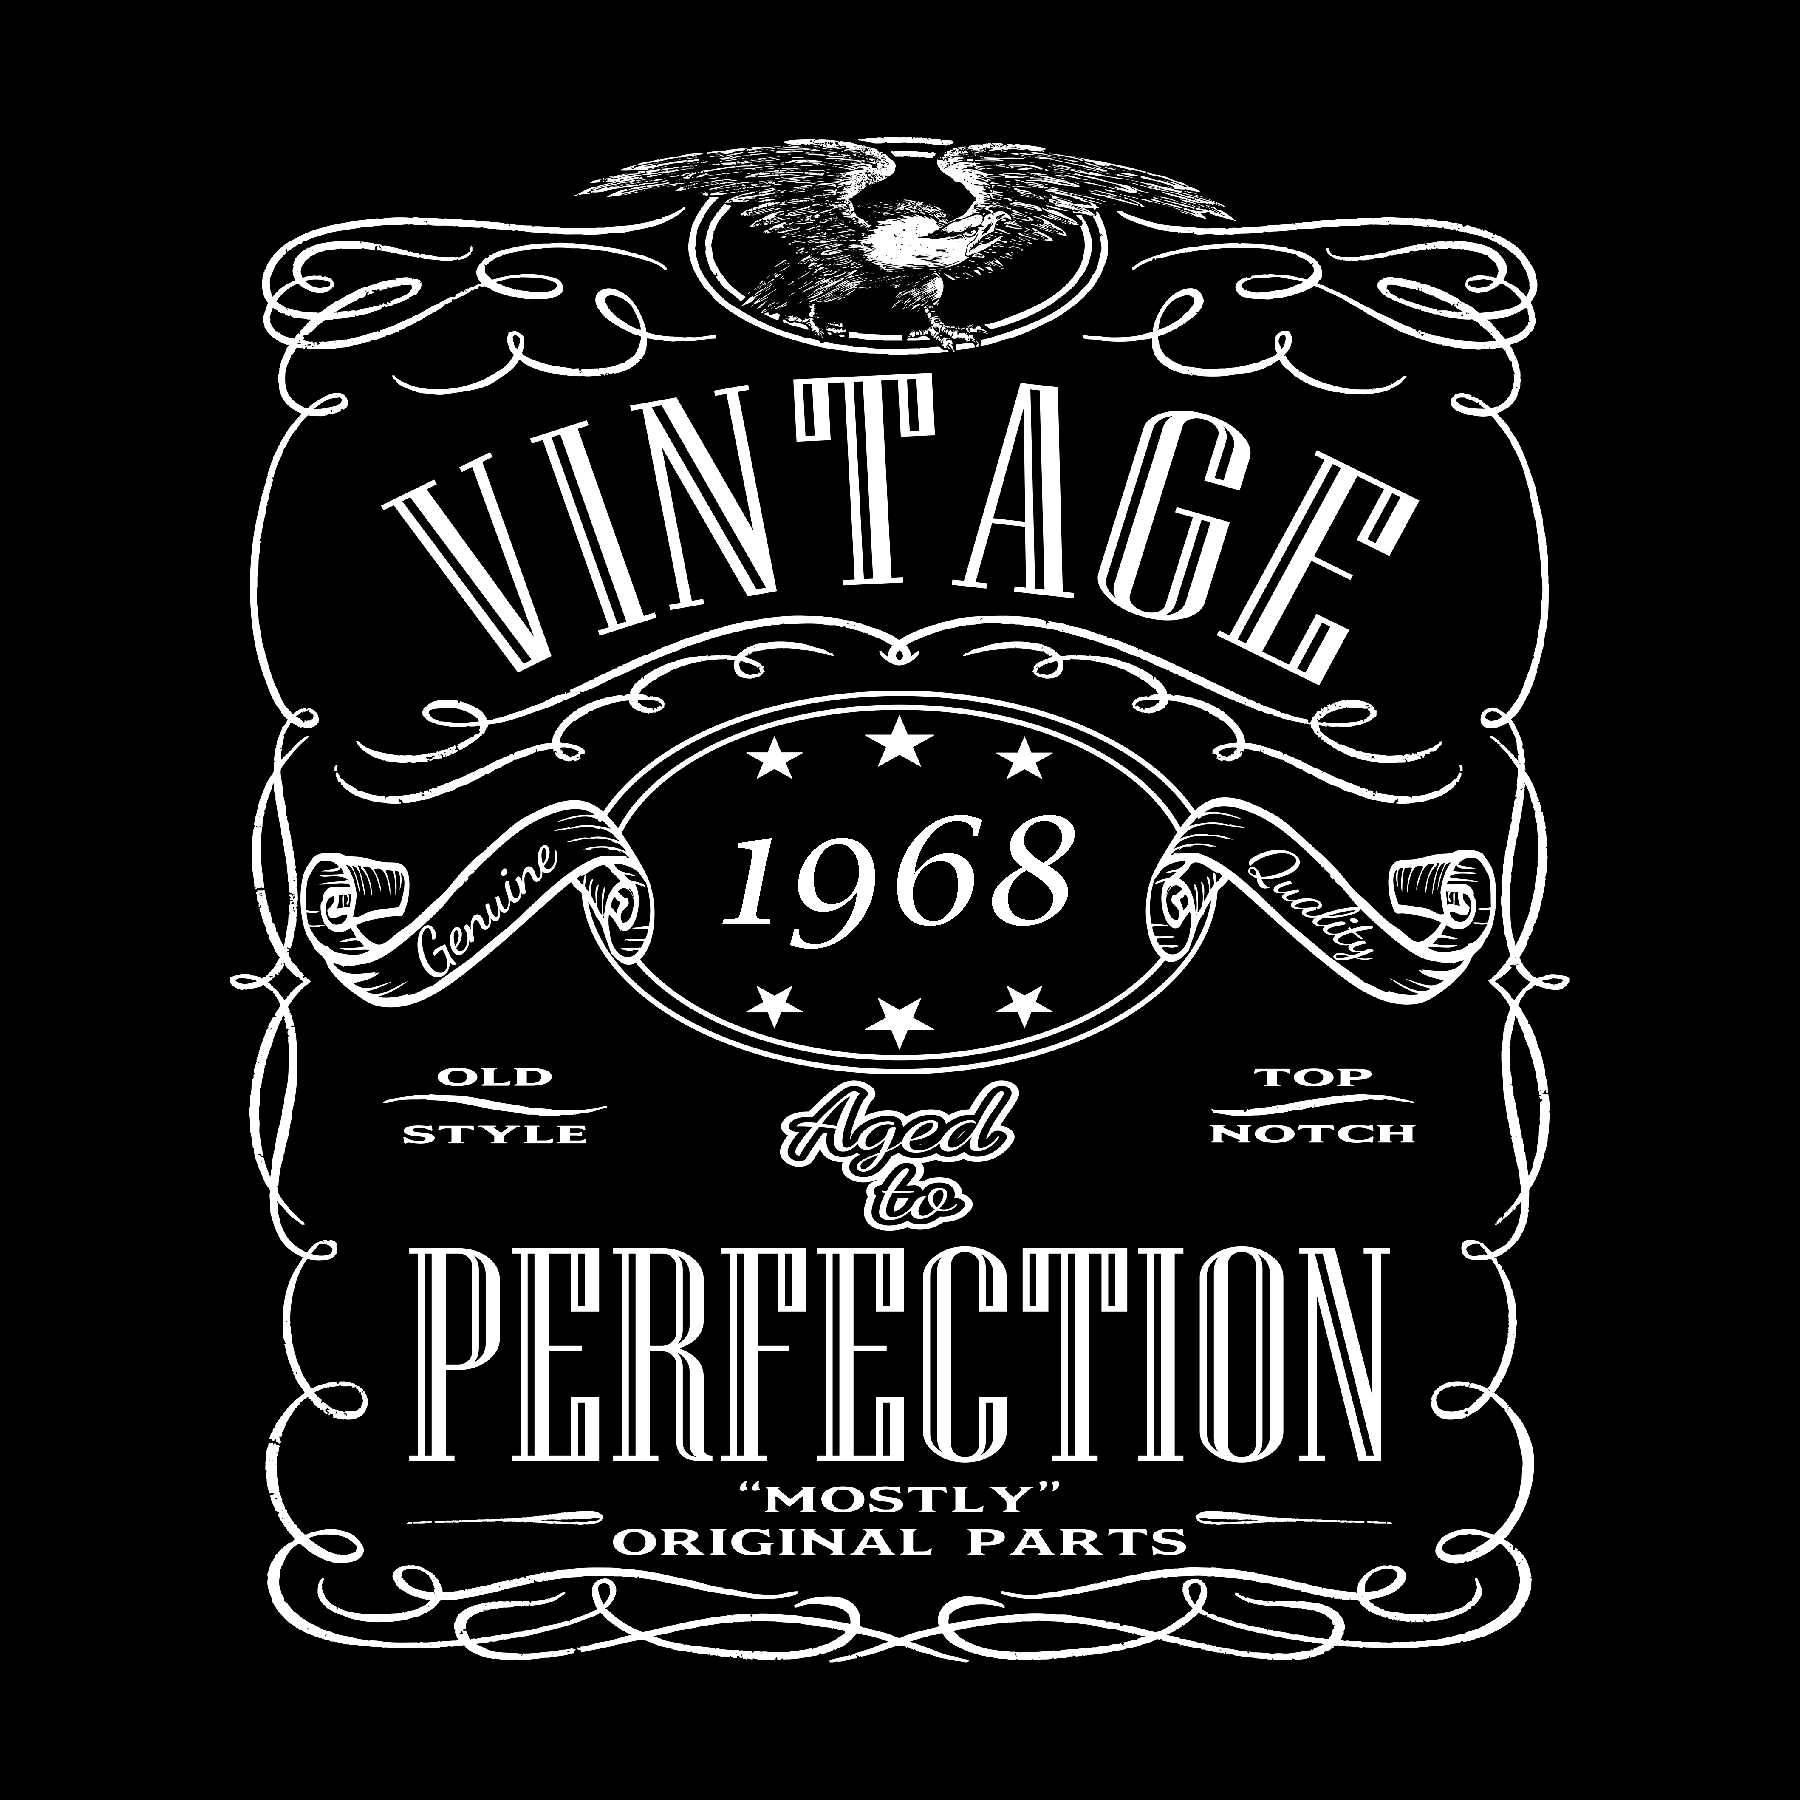 50th Birthday Shirt - Born in 1968 Birthday Shirt - 50th Birthday Gift -  Birthday Gift For 50th Birthday - Husband Gift - Dad Gift - Grandpa